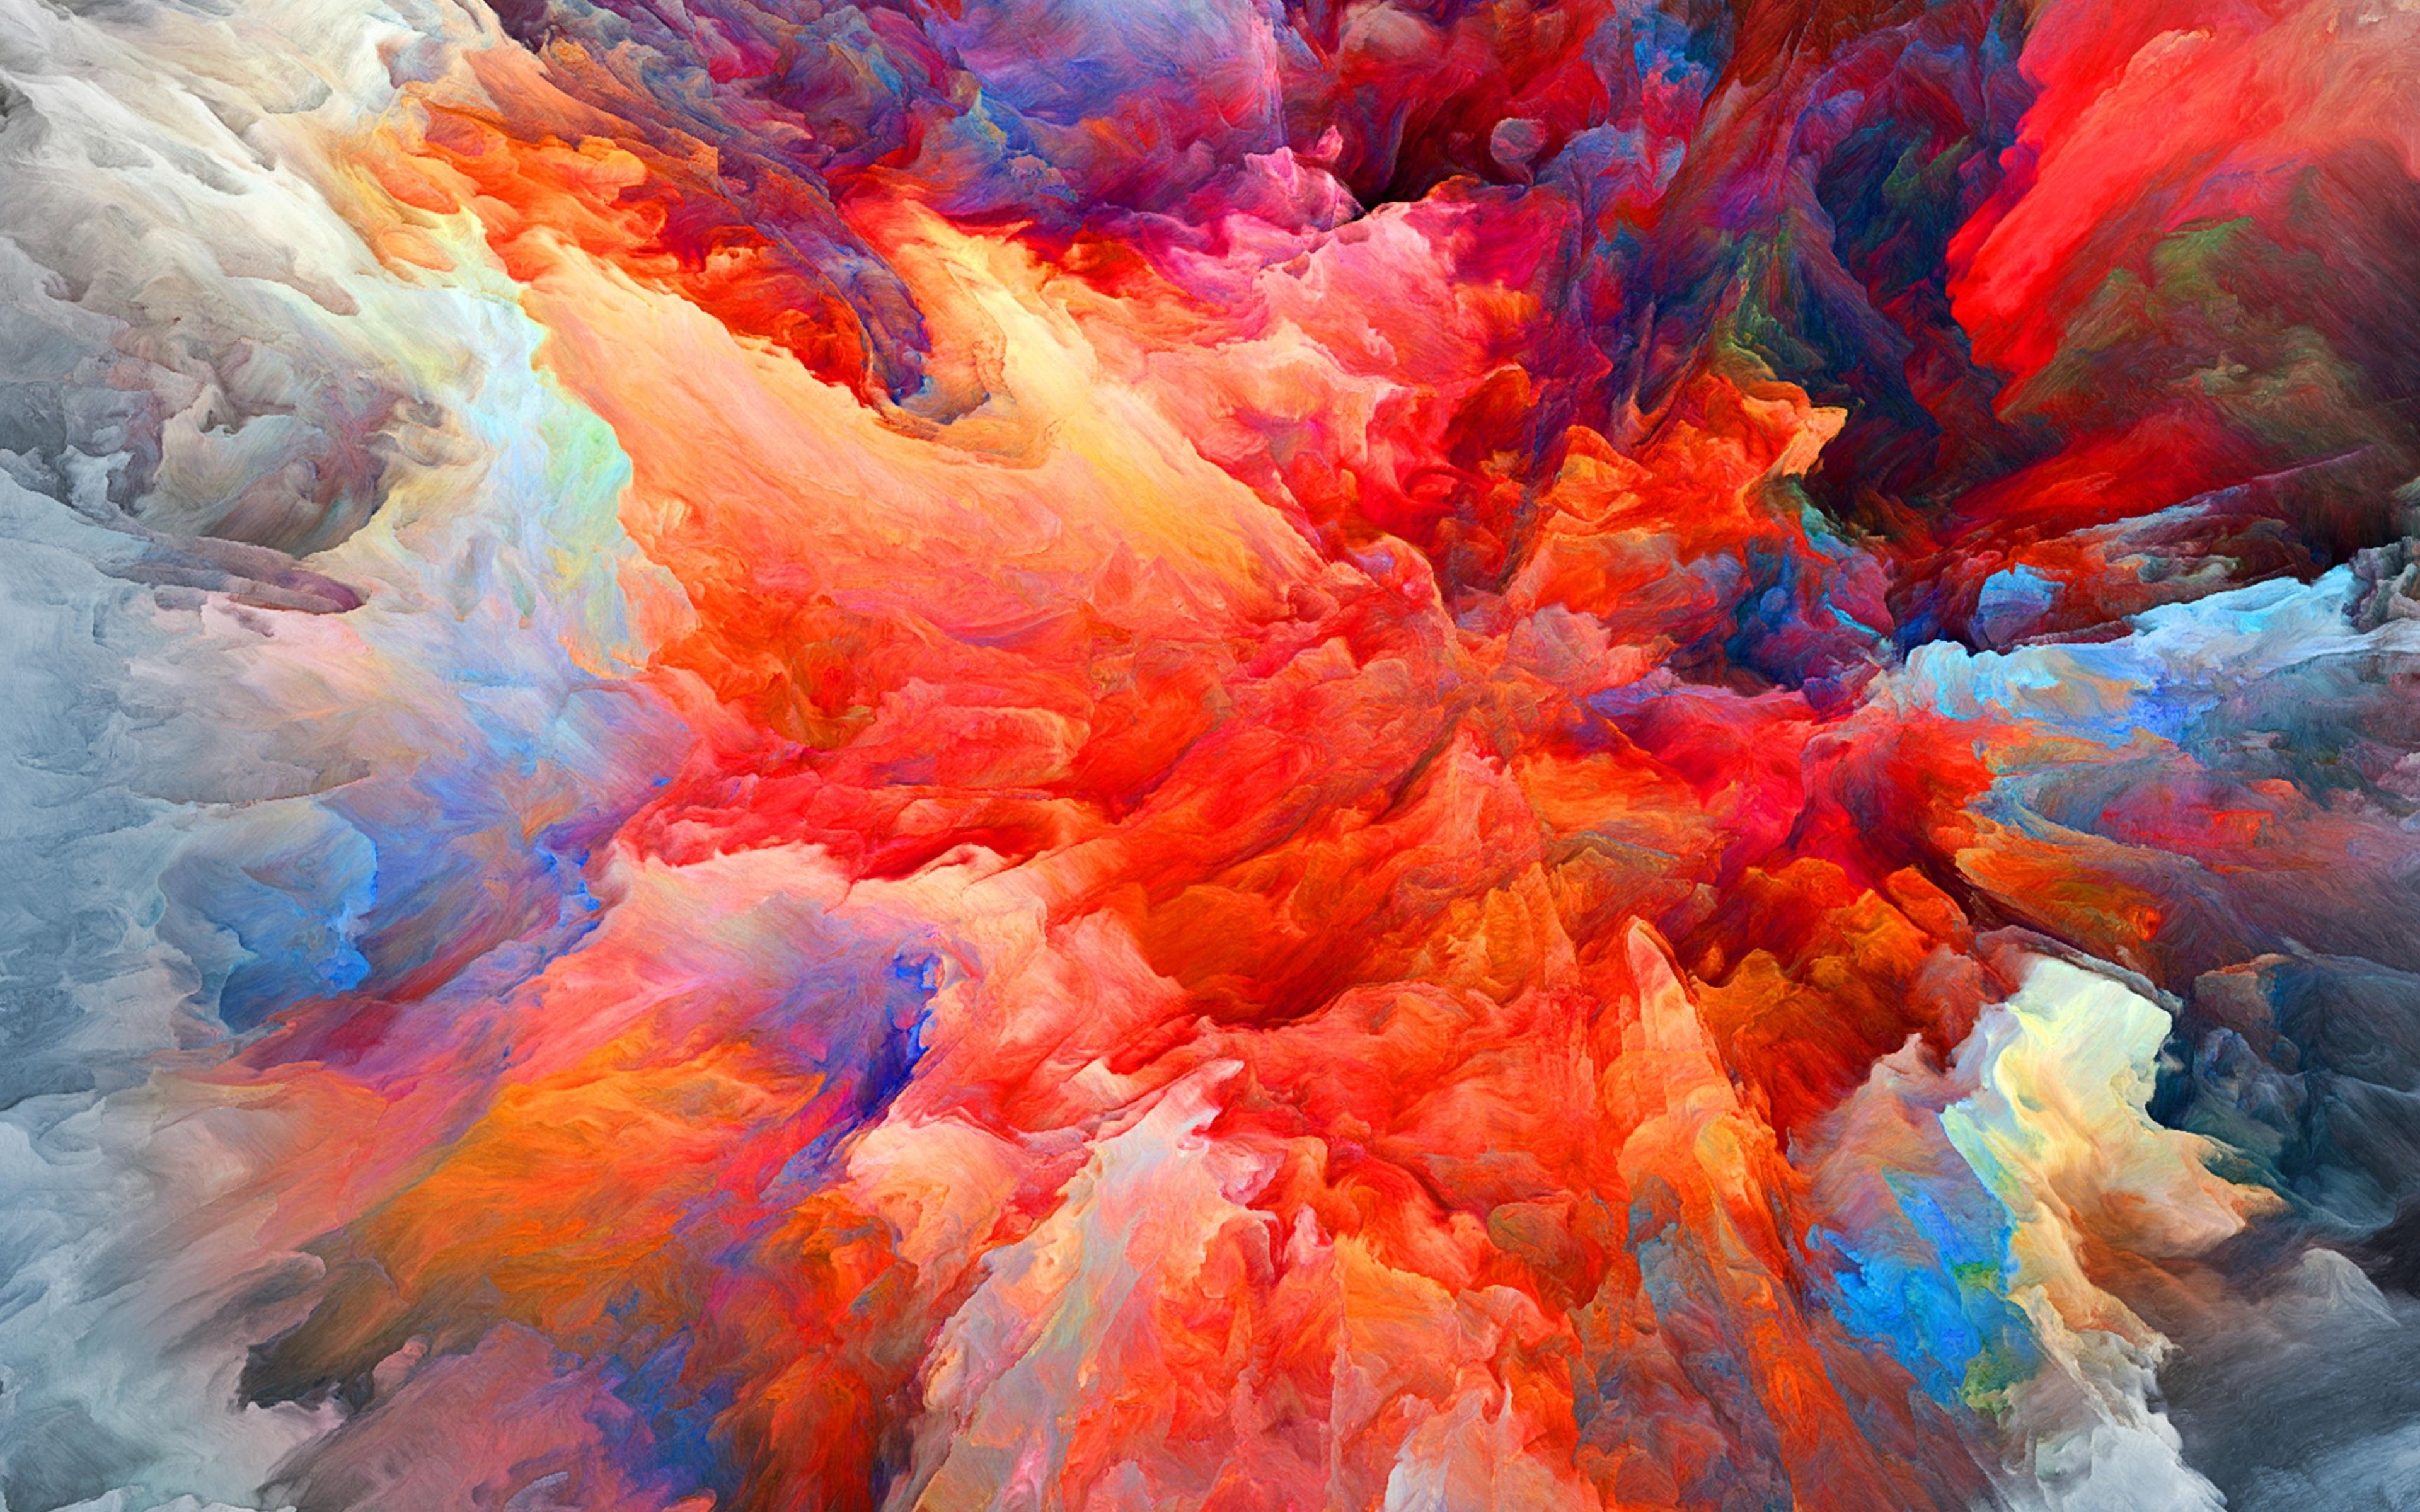 3840x2400 4k Colorful Blast Of Smoke 4k 3840x2400 Resolution